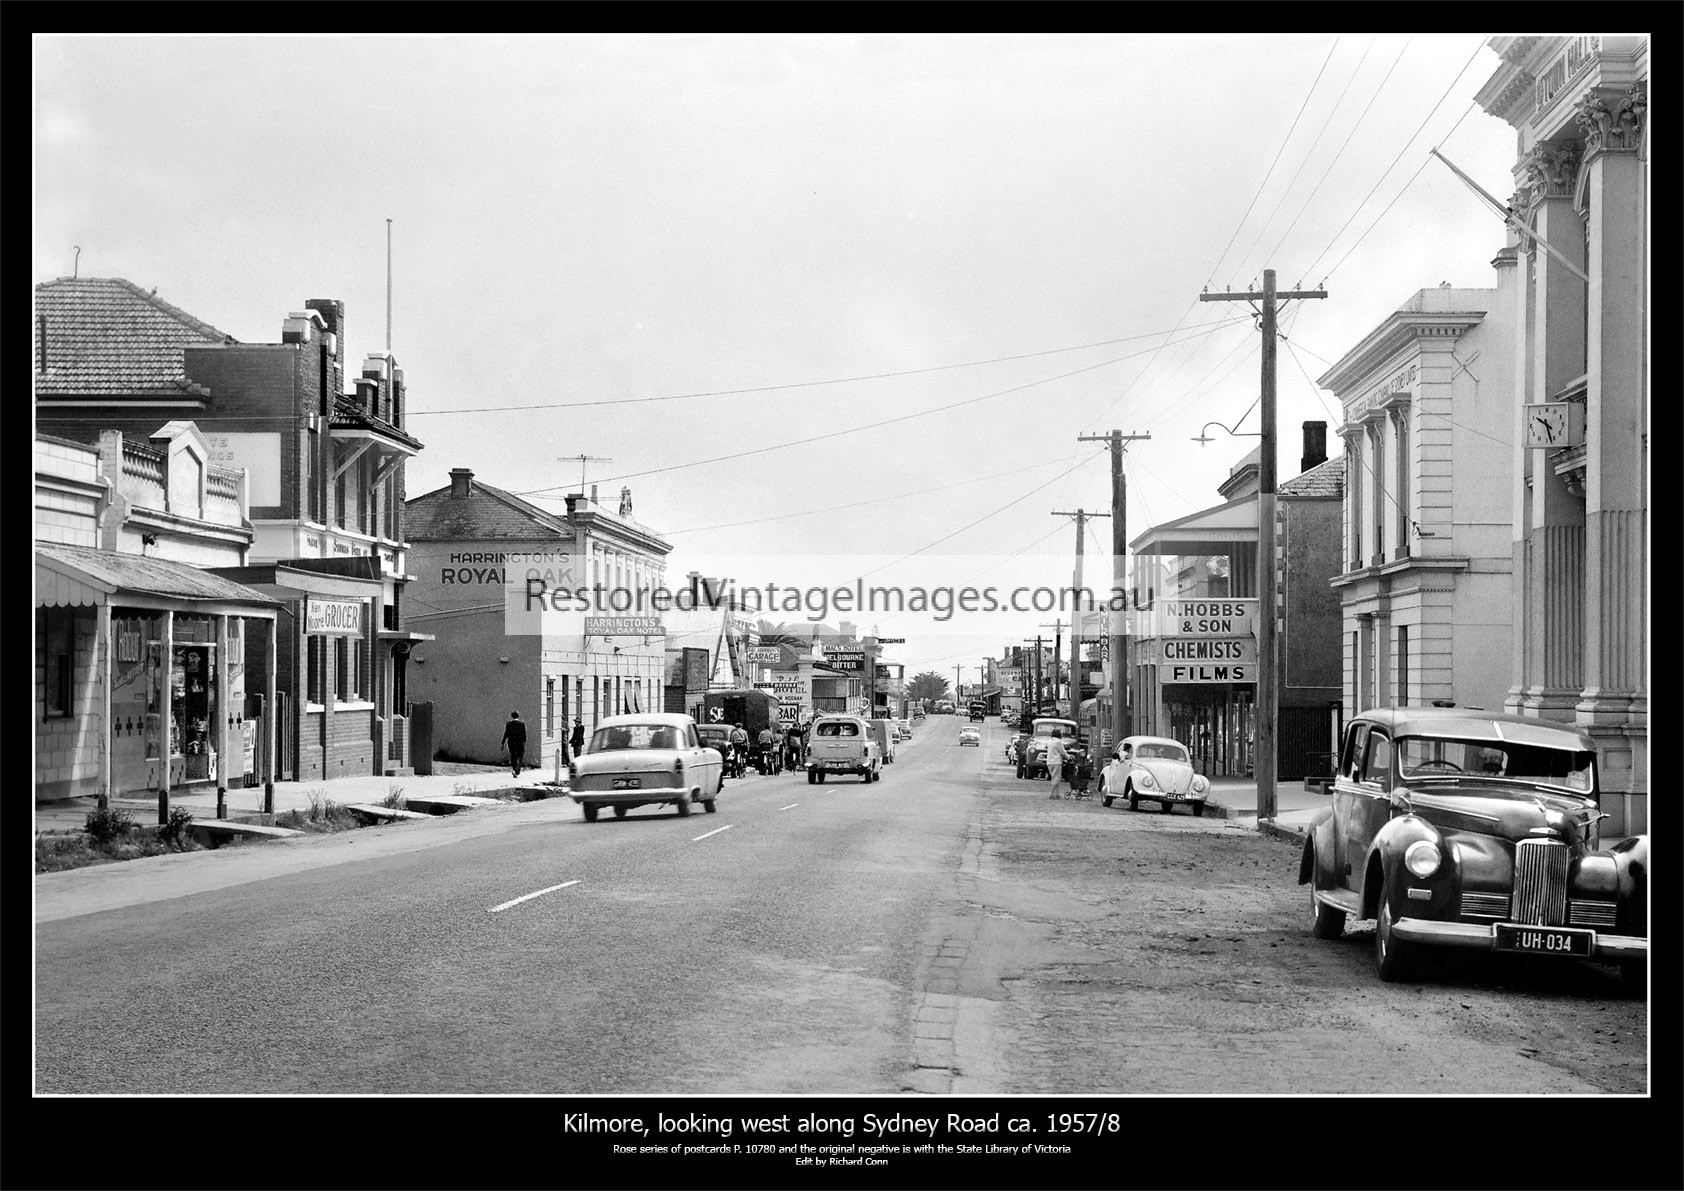 Kilmore, Looking West Along Sydney Street Ca. 1957/8